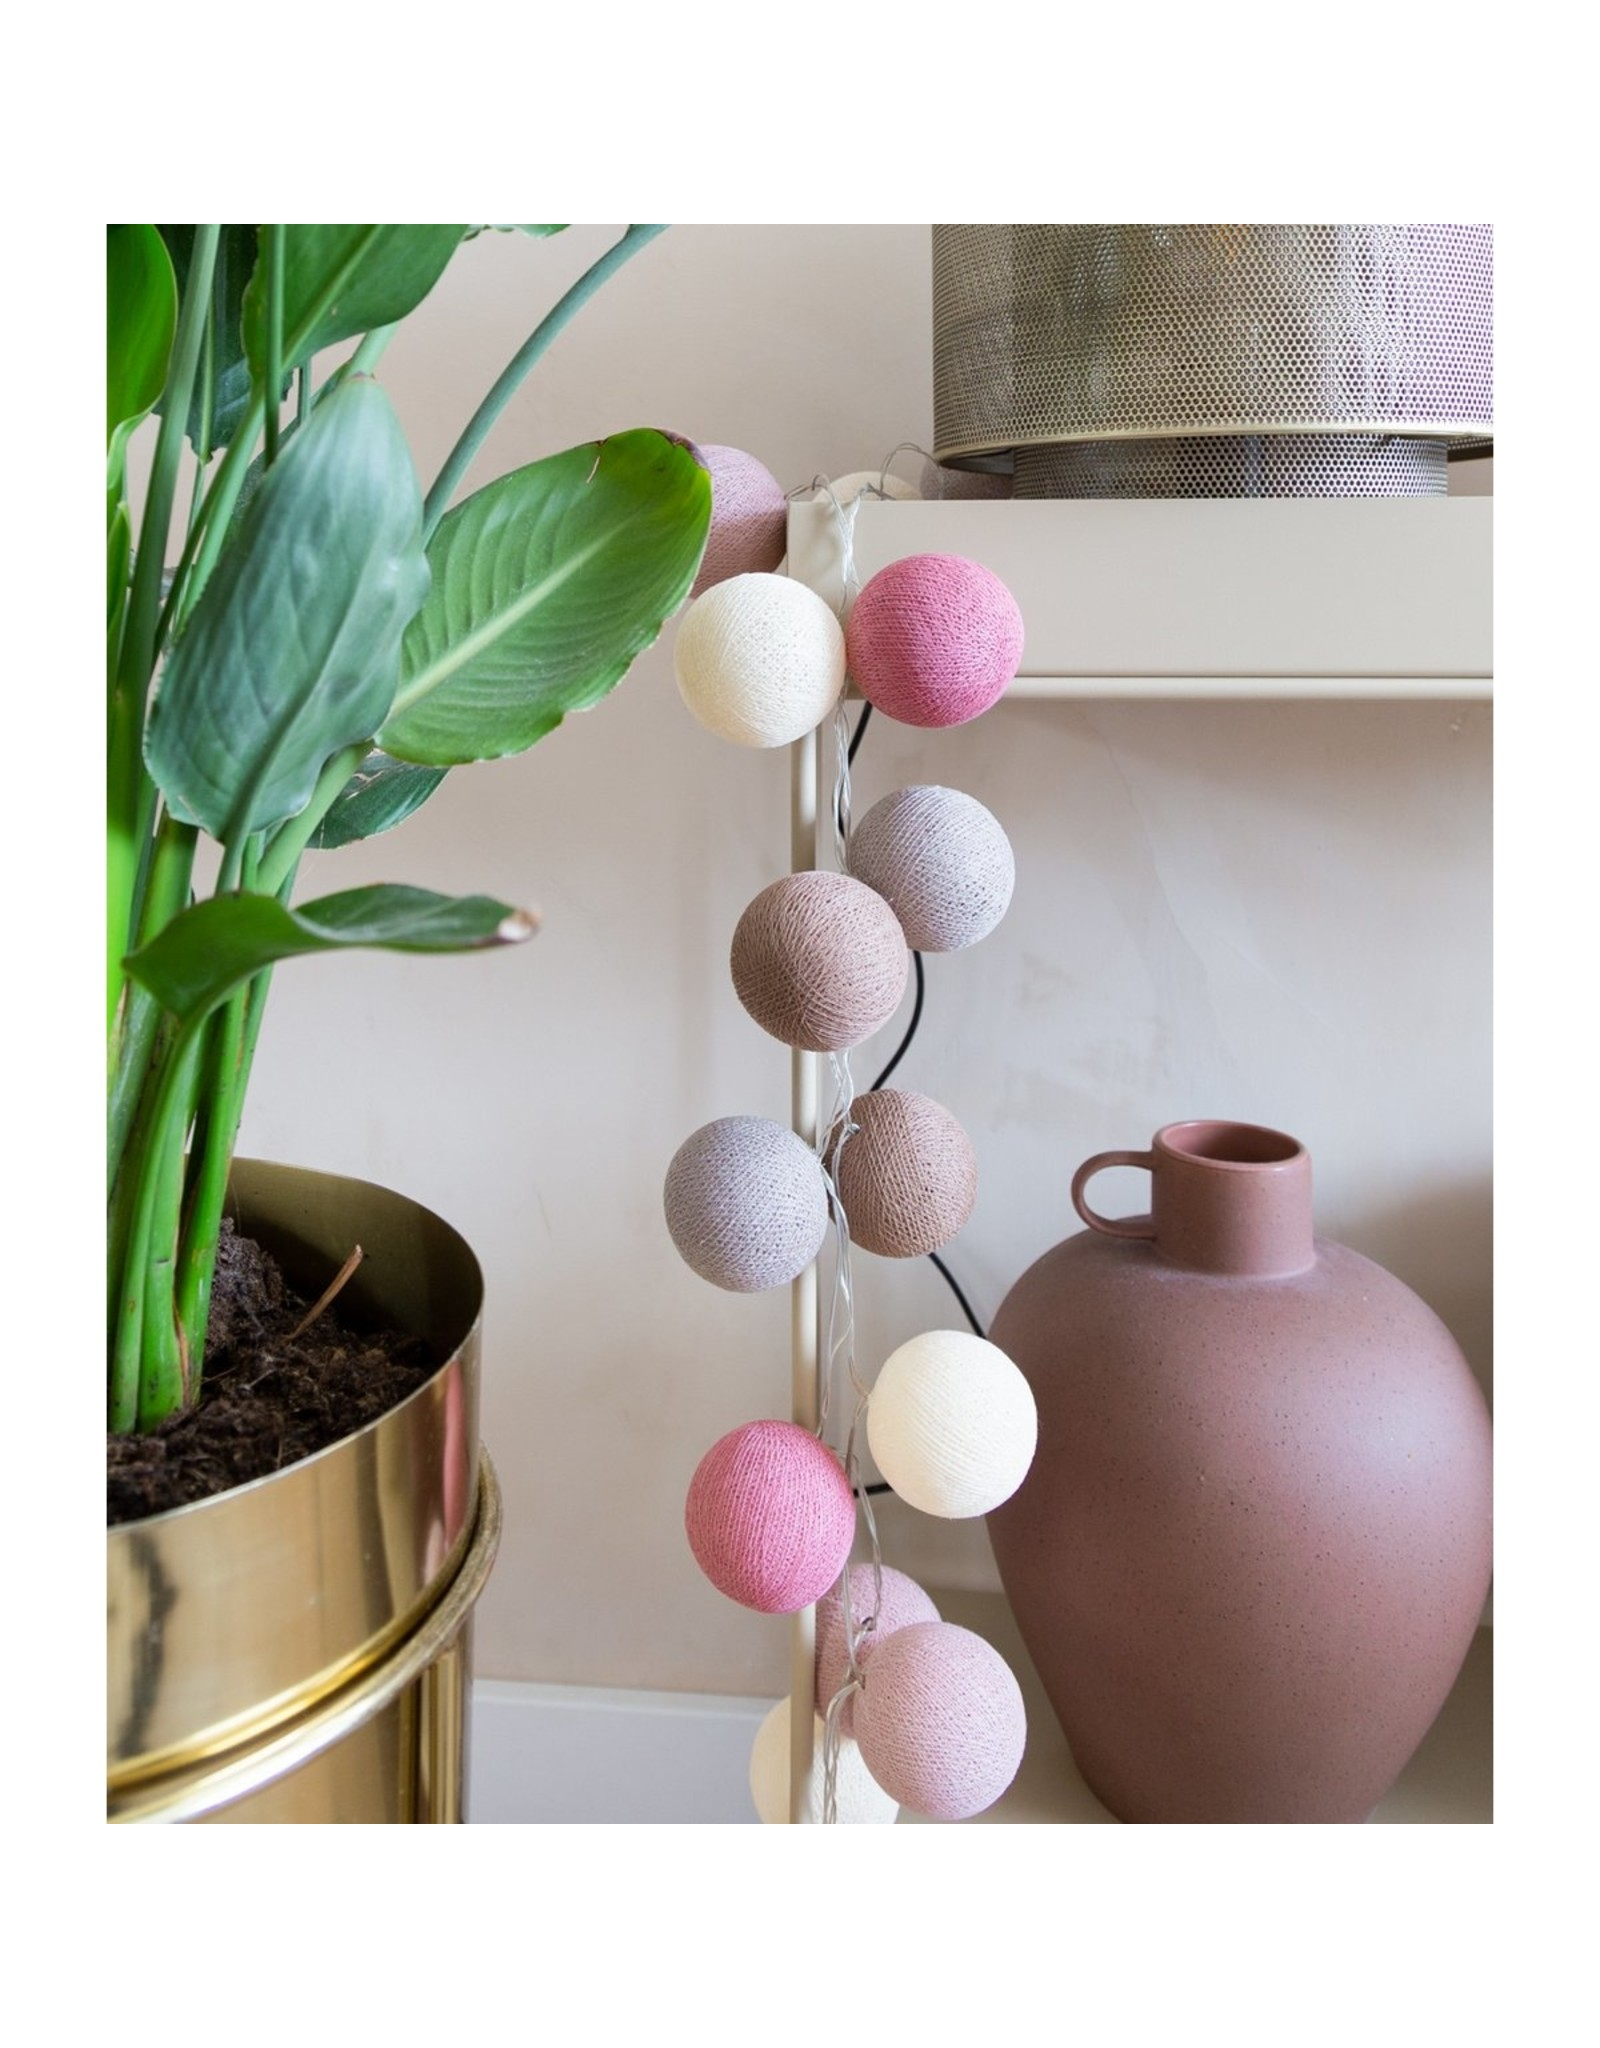 Cotton Ball lichtsnoer: Beloved 50 stuks